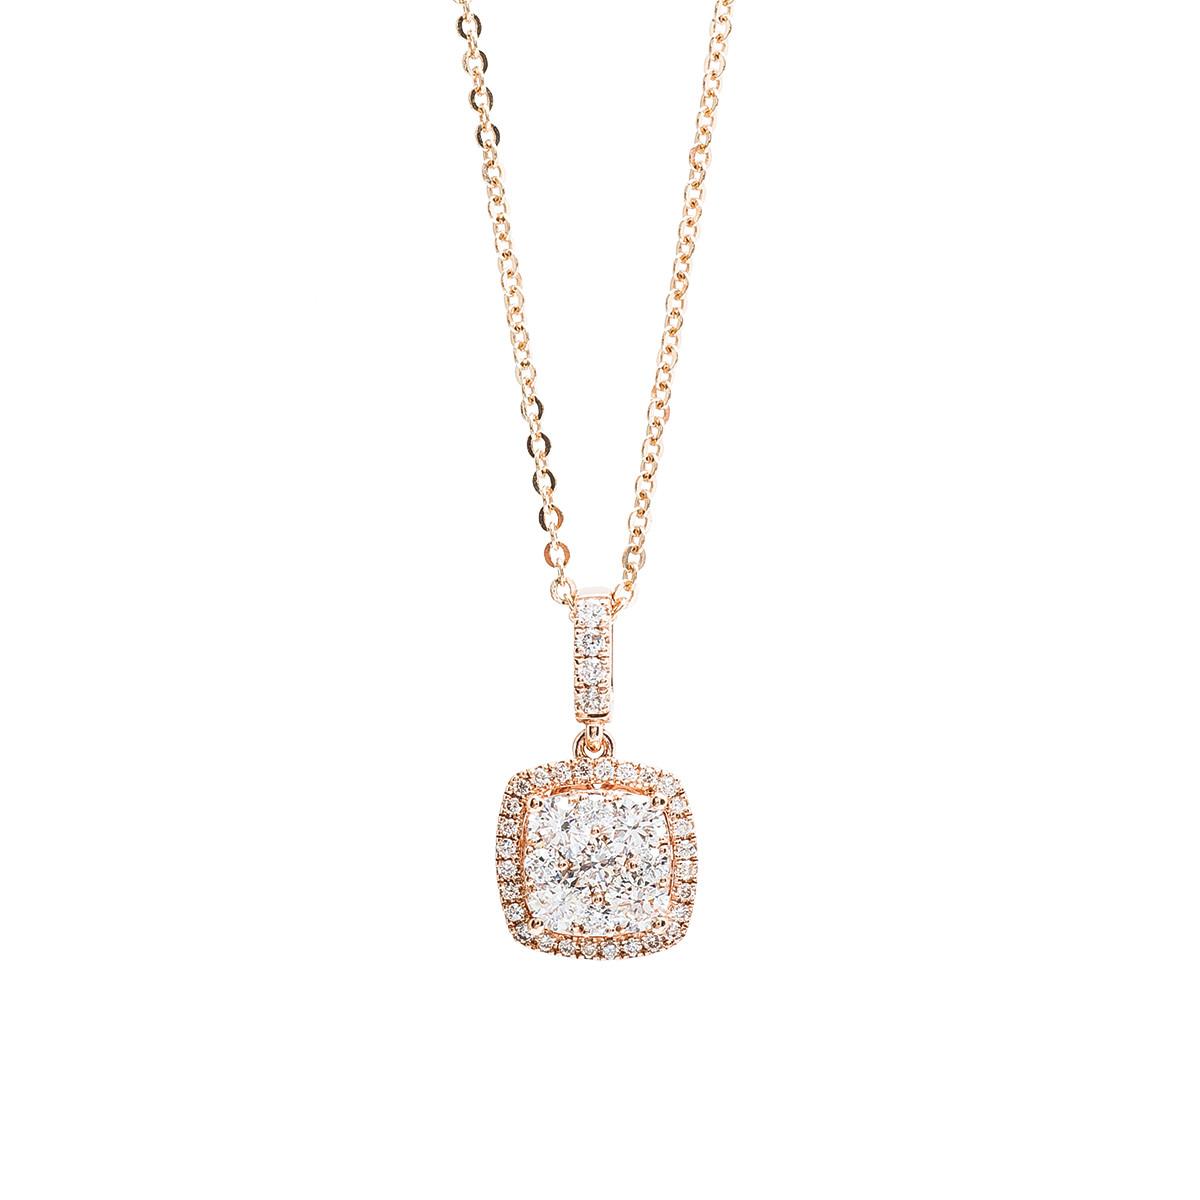 New 0.65 CTW Diamond Cluster Necklace